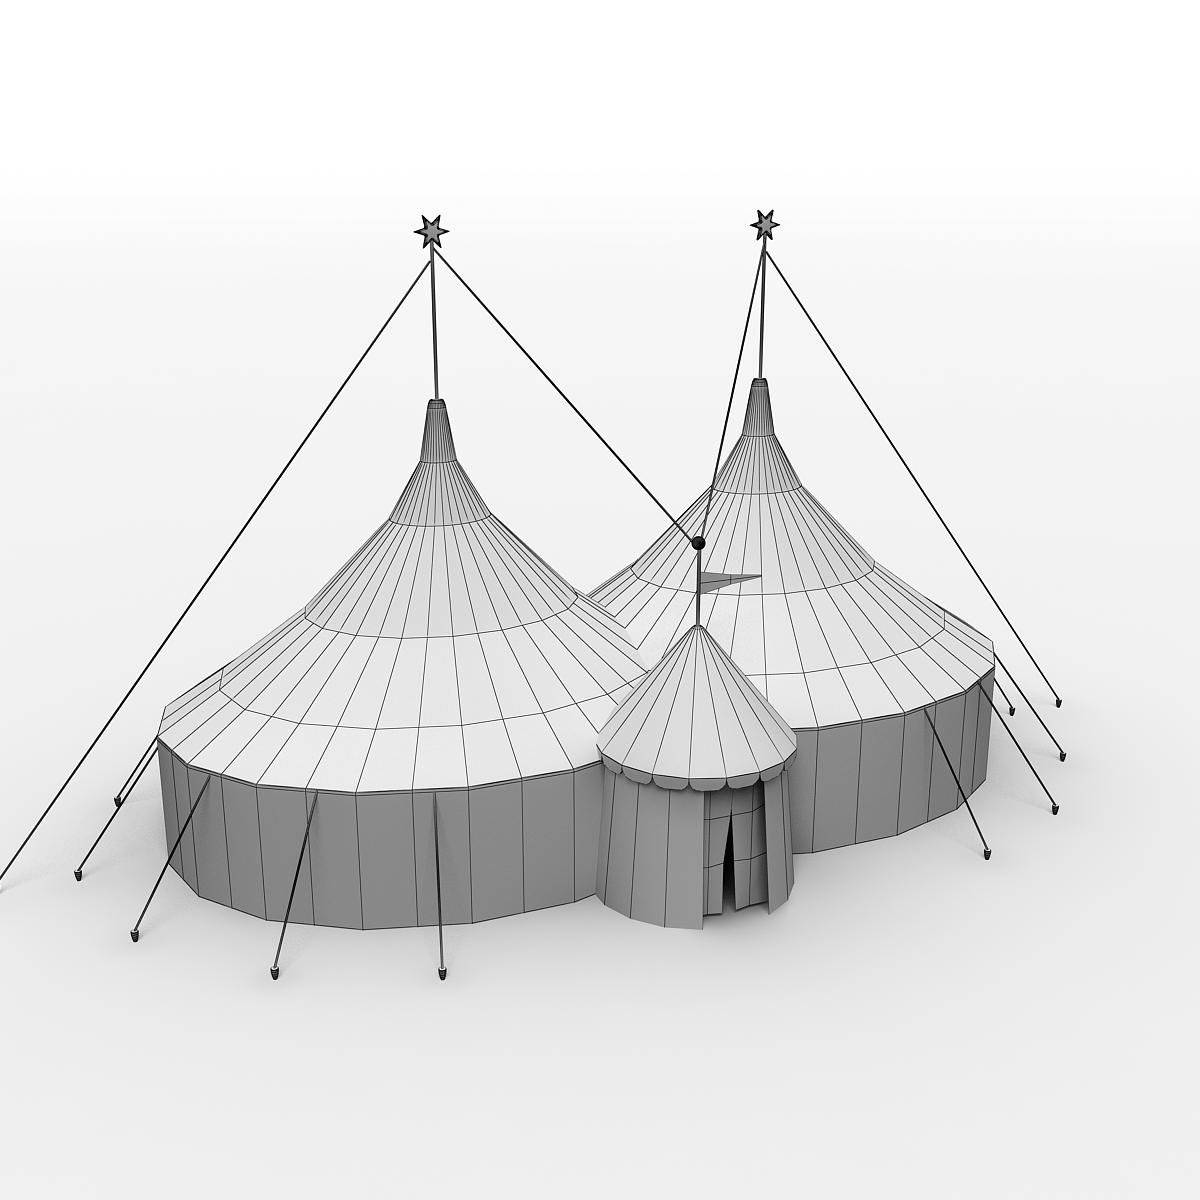 13 Paper Circus Tent Craft